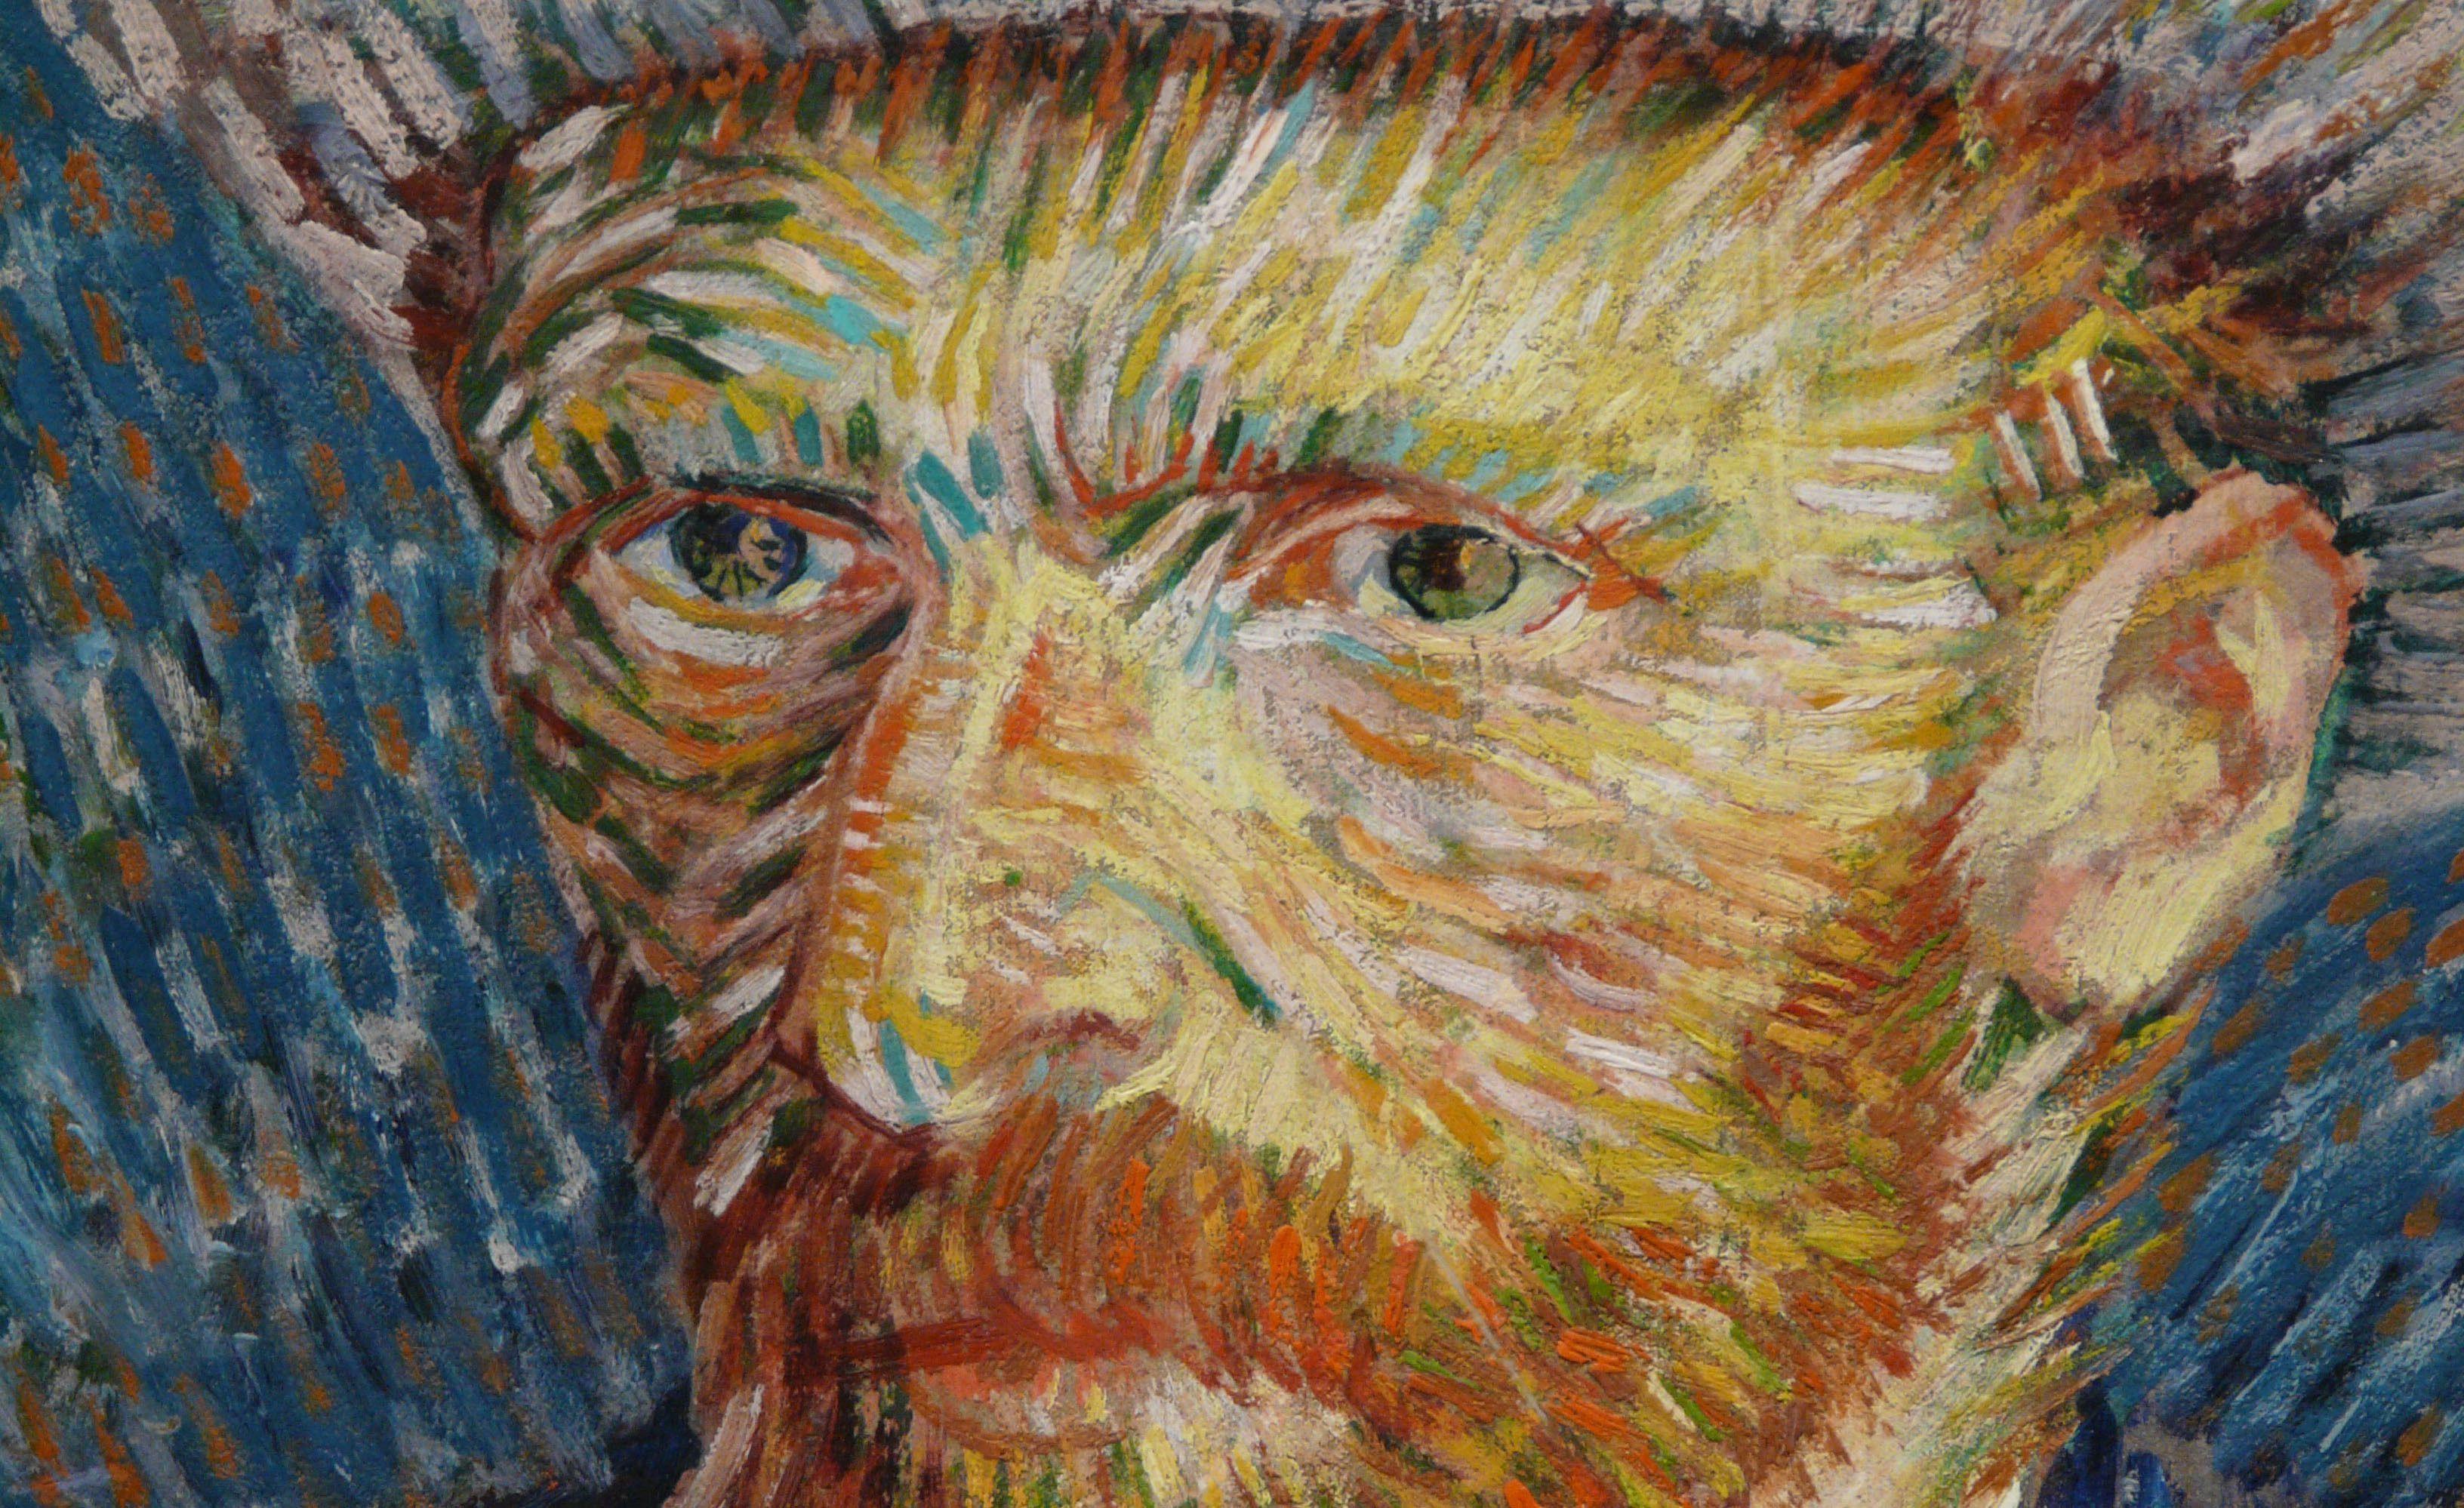 Skip-the-Line Van Gogh Museum Tickets